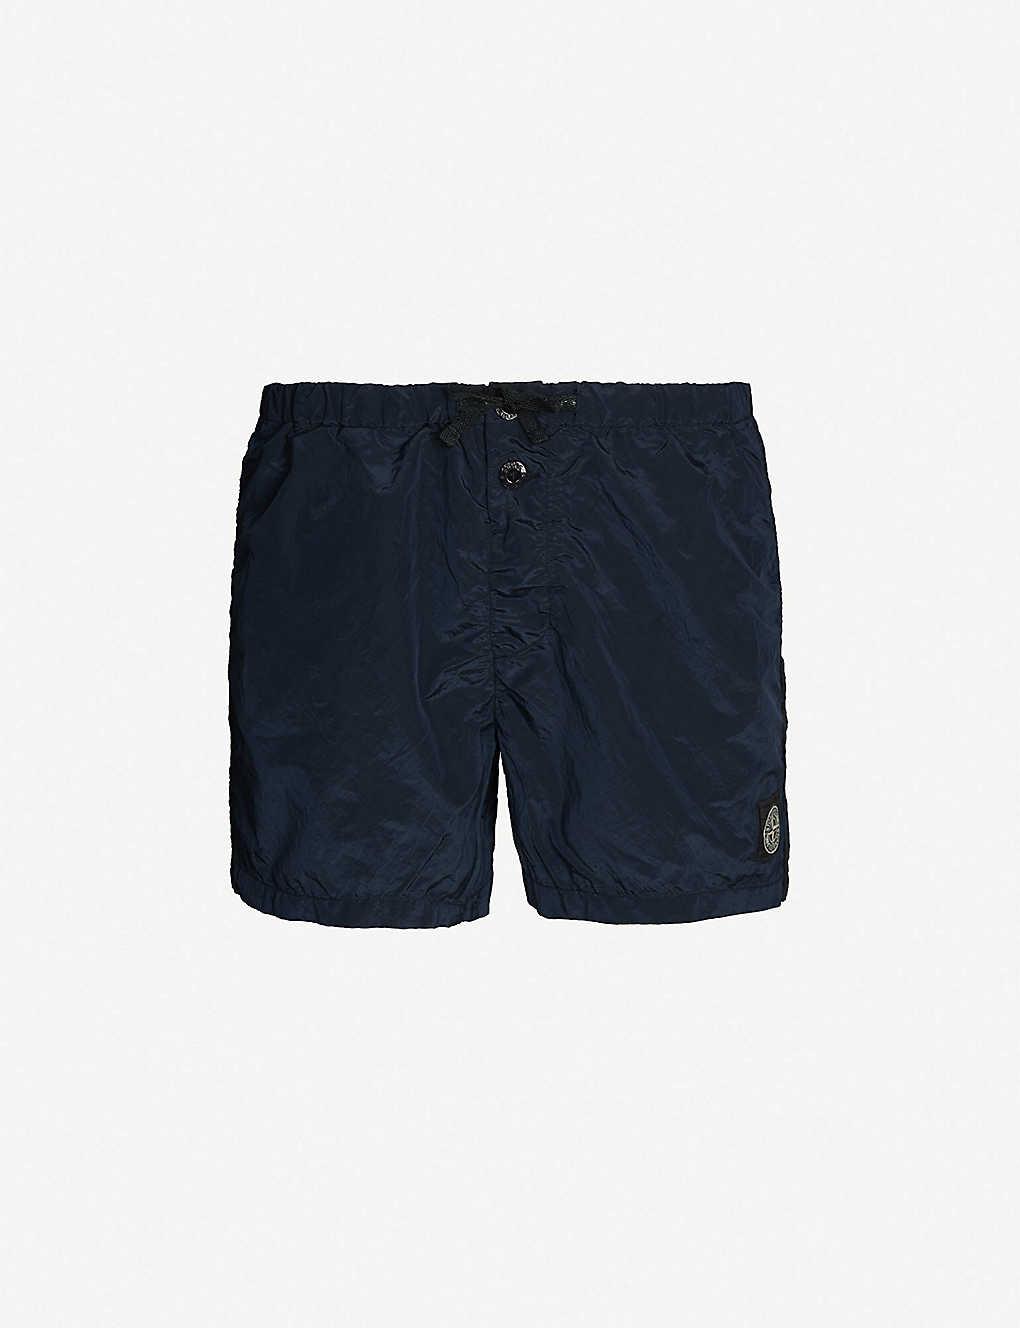 5f60fe8982 STONE ISLAND - Drawstring-waist shell swim shorts | Selfridges.com